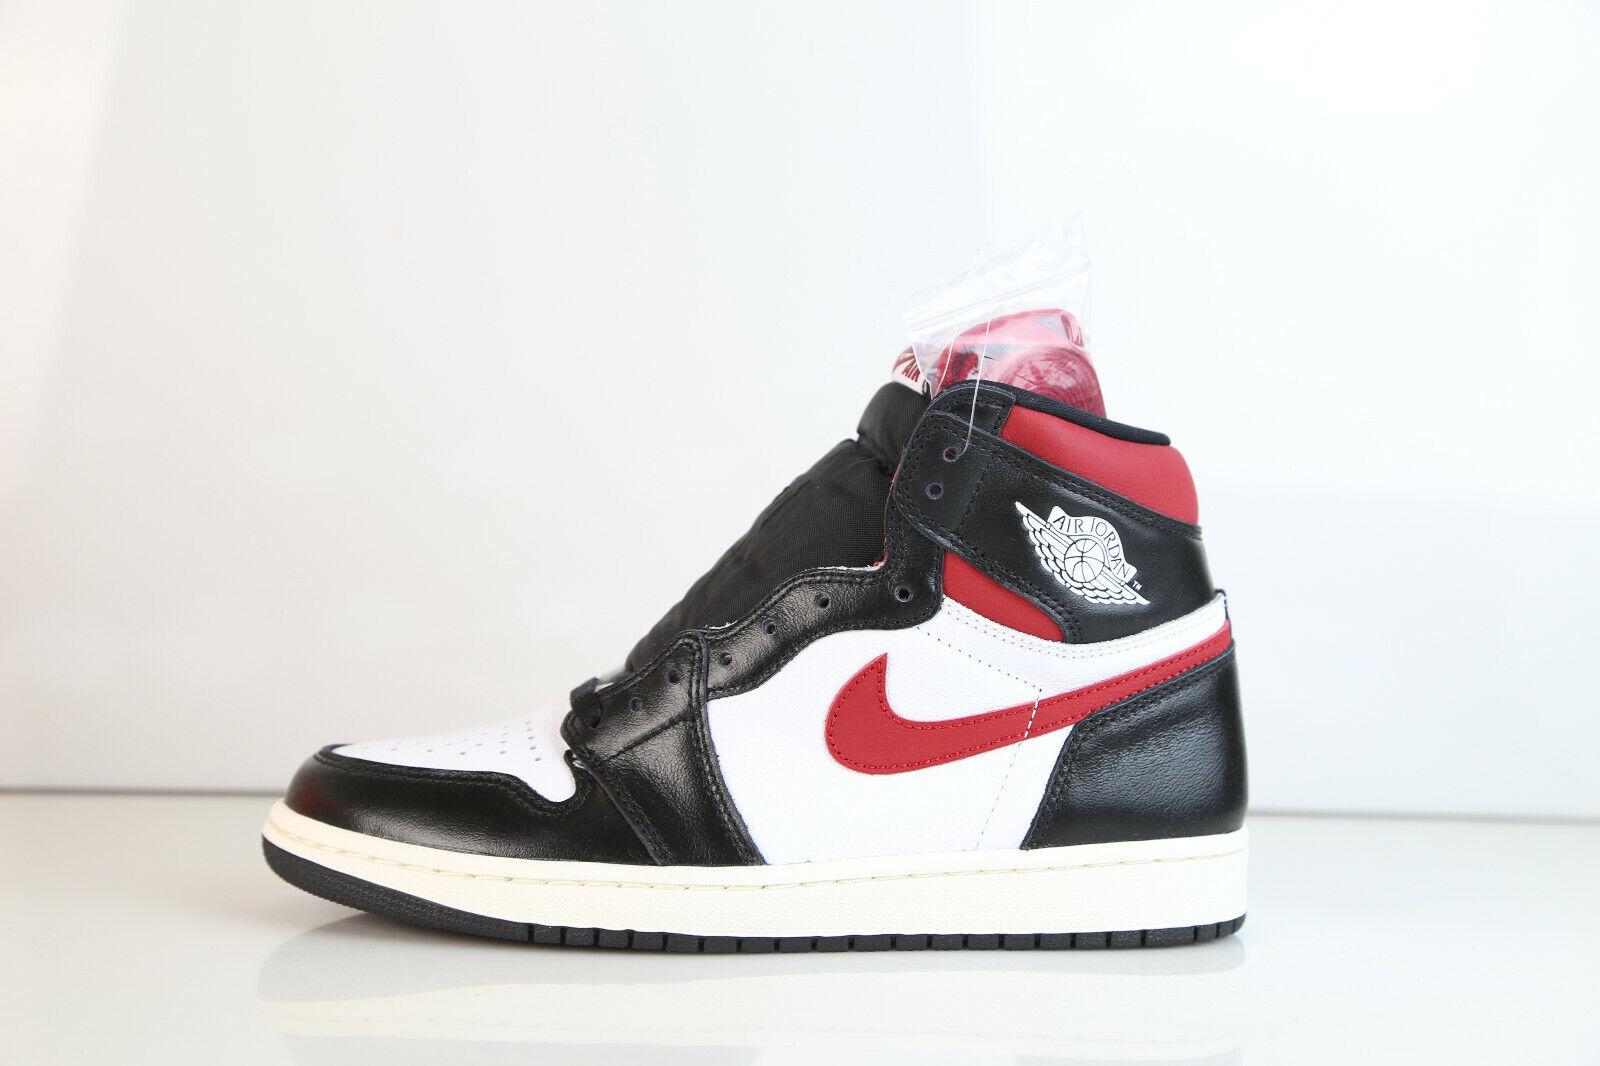 reputable site f6069 d85f0 Nike Air Jordan Retro 1 High OG Black White Sail Gym Red 555088-061 7-15